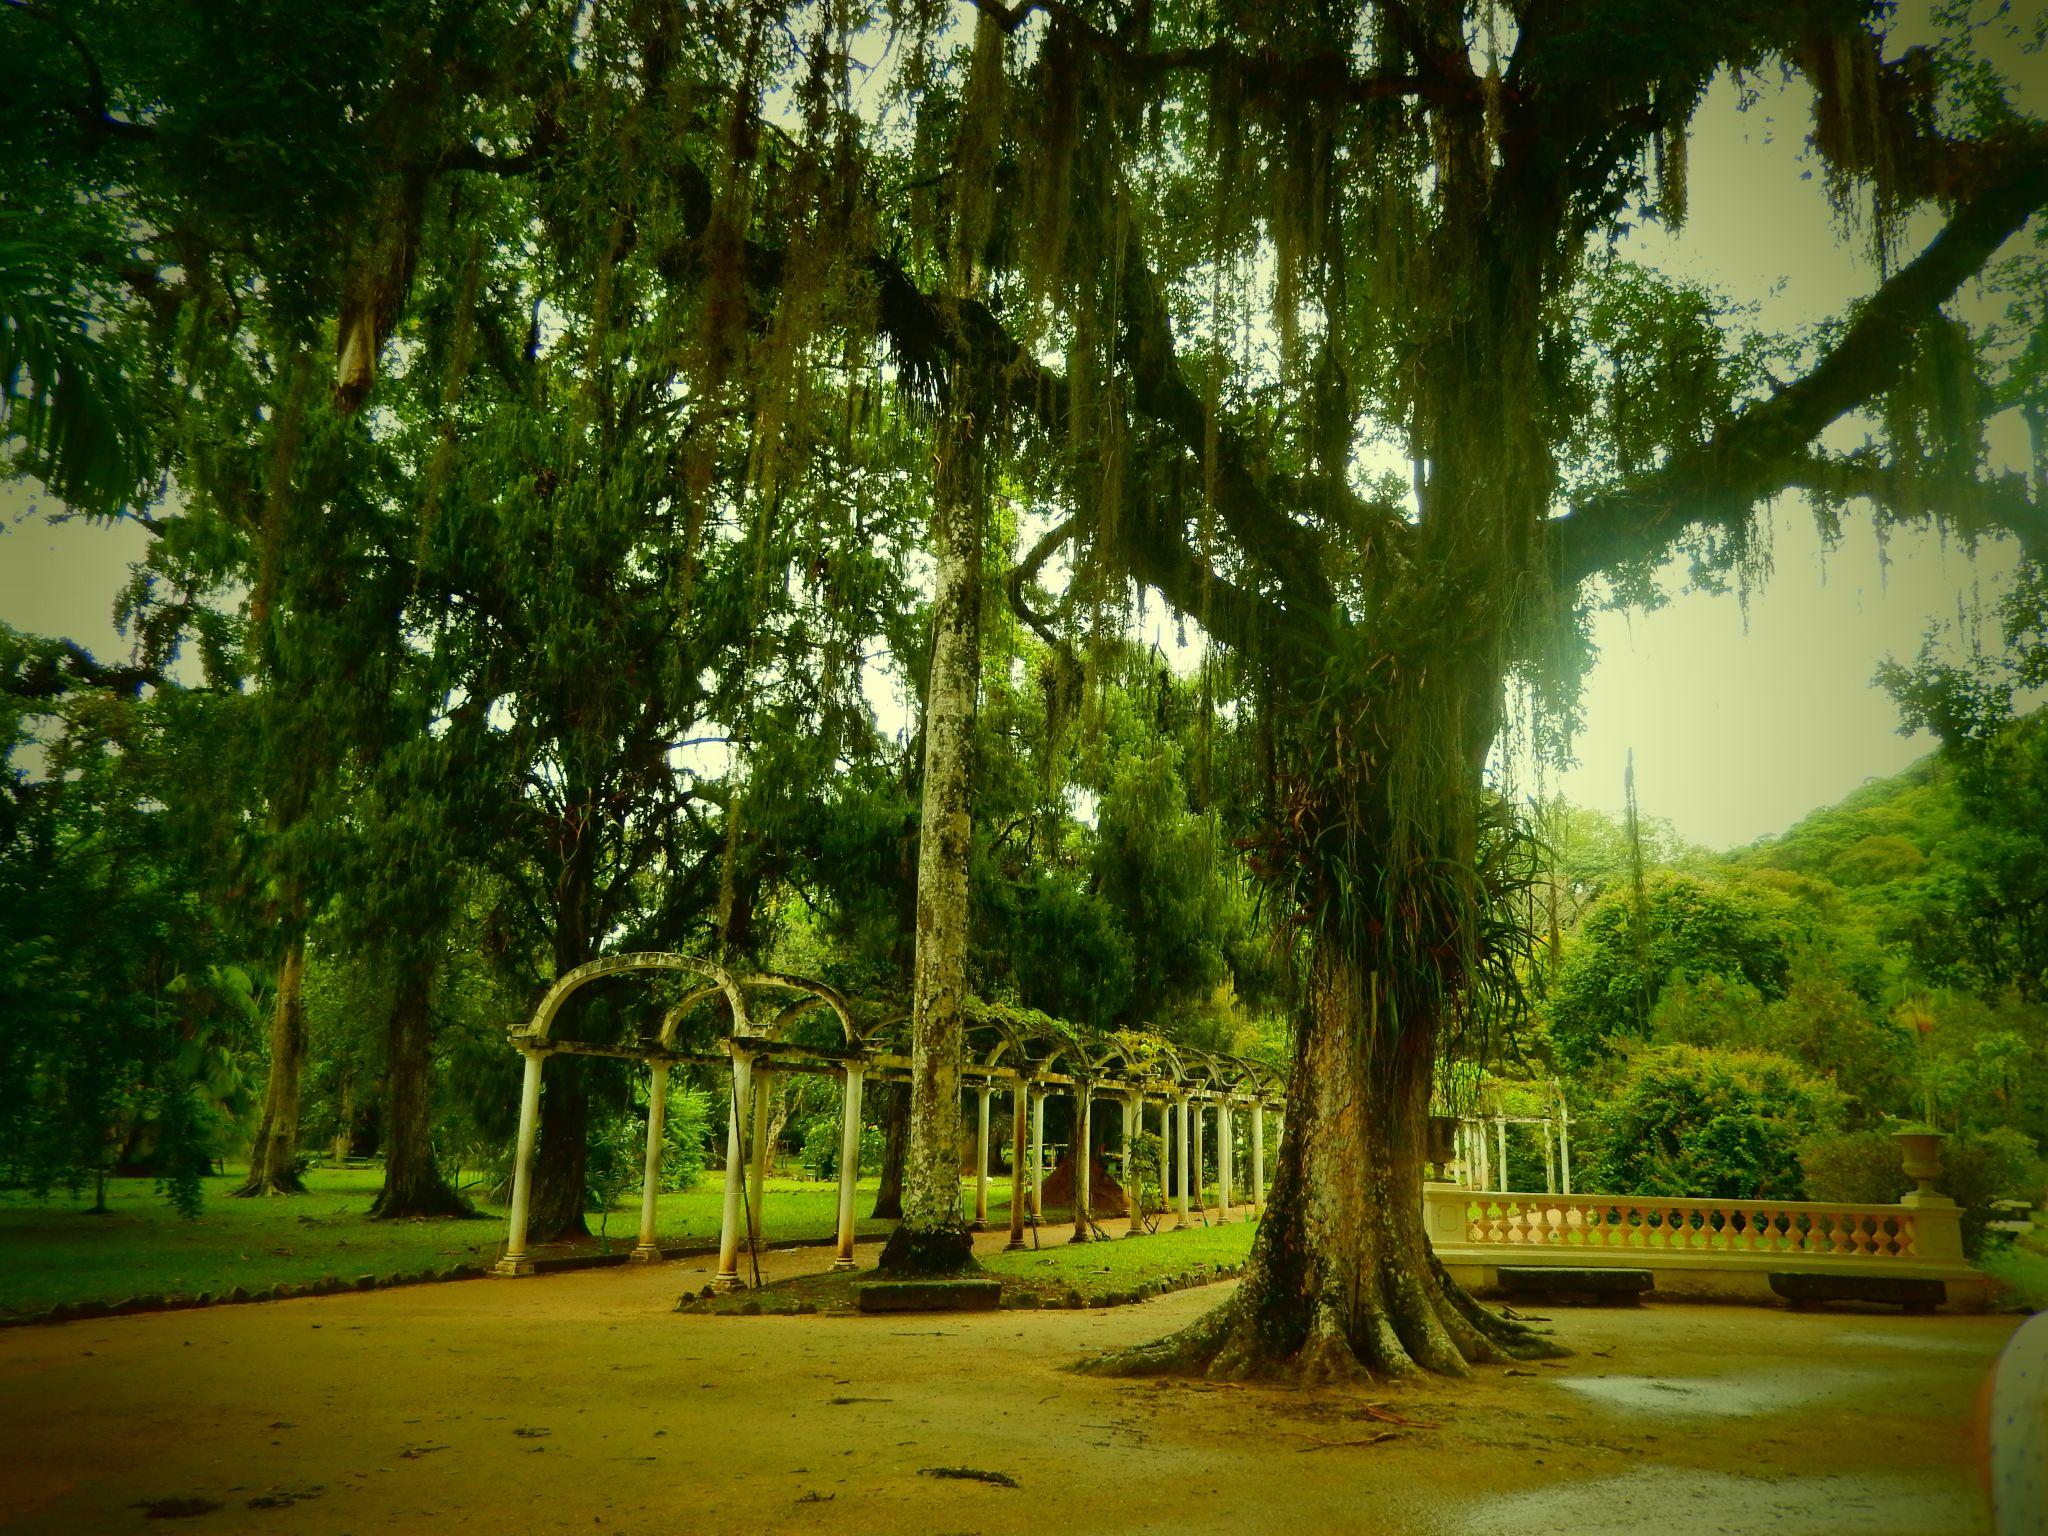 Trees in Jardim Botanico in Rio de Janeiro